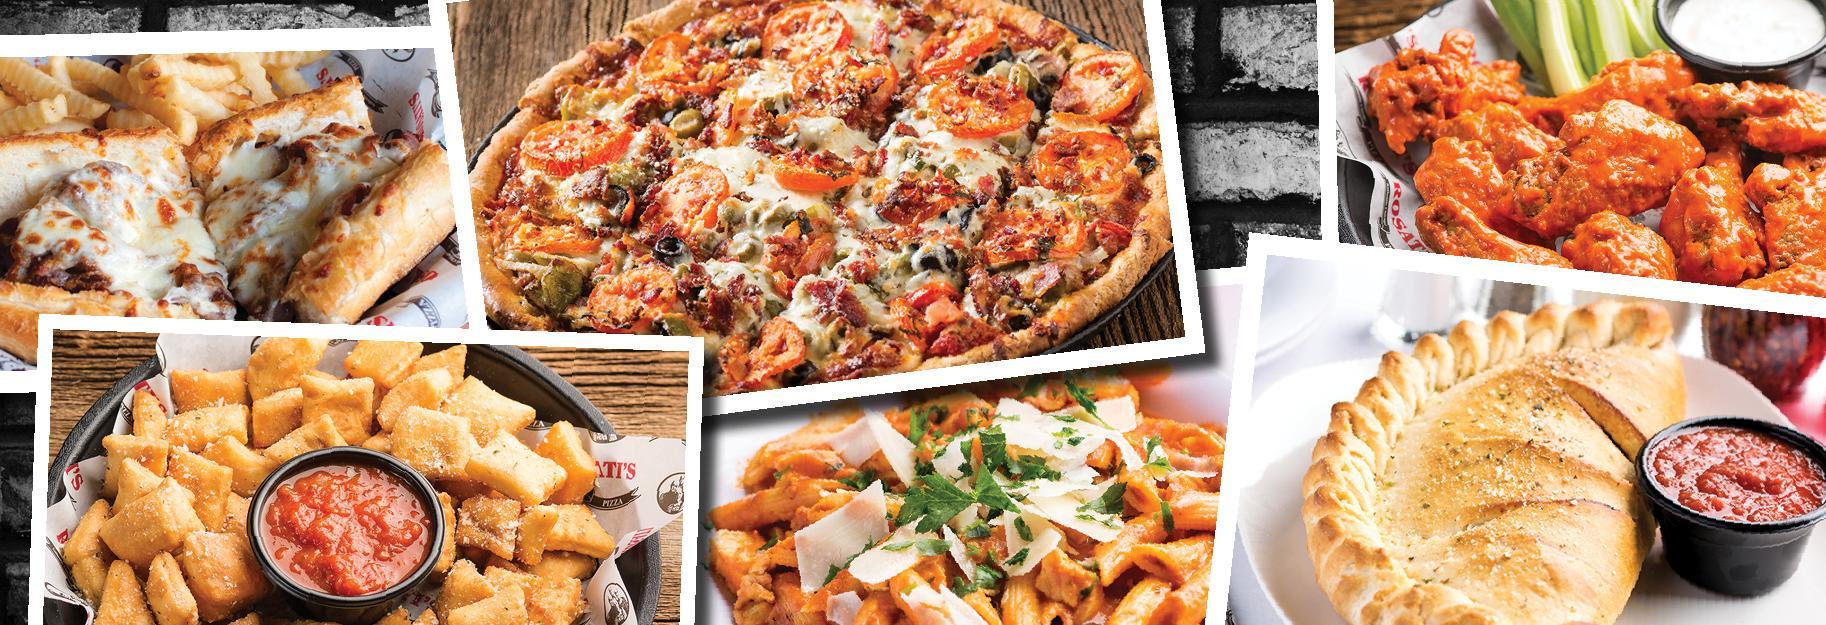 Rosati's Pizza & Sports Bar-Hoschton, GA banner